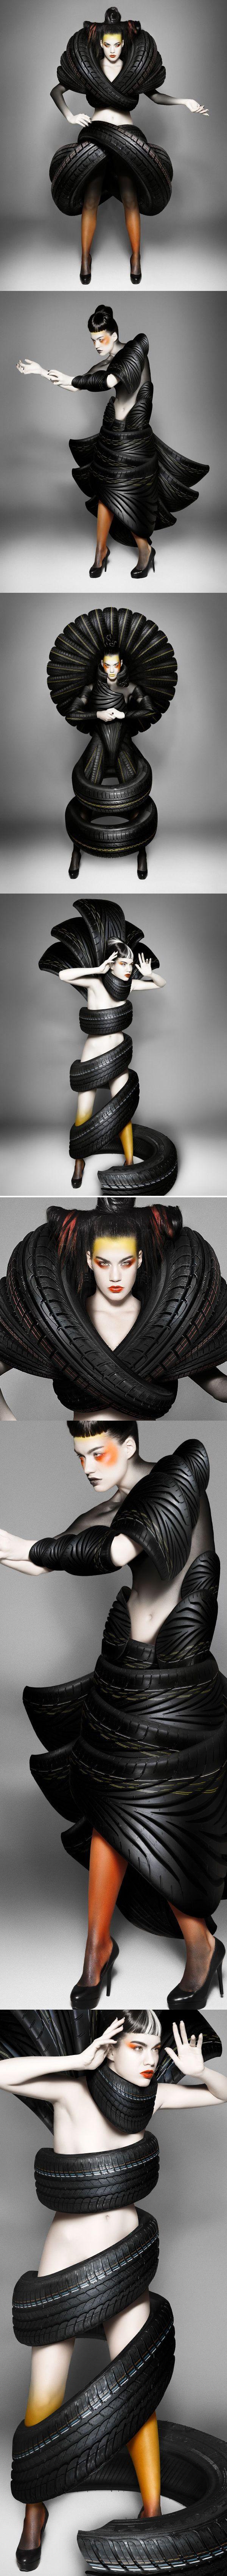 TREADWEAR  COSTUME DESIGN & POSTPRODUCTION  Carl Elkins @ Mierswa-Kluska    PHOTOGRAPHY  Mierswa-Kluska    HAIR & MAKE-UP  Susan Voss-Redfern